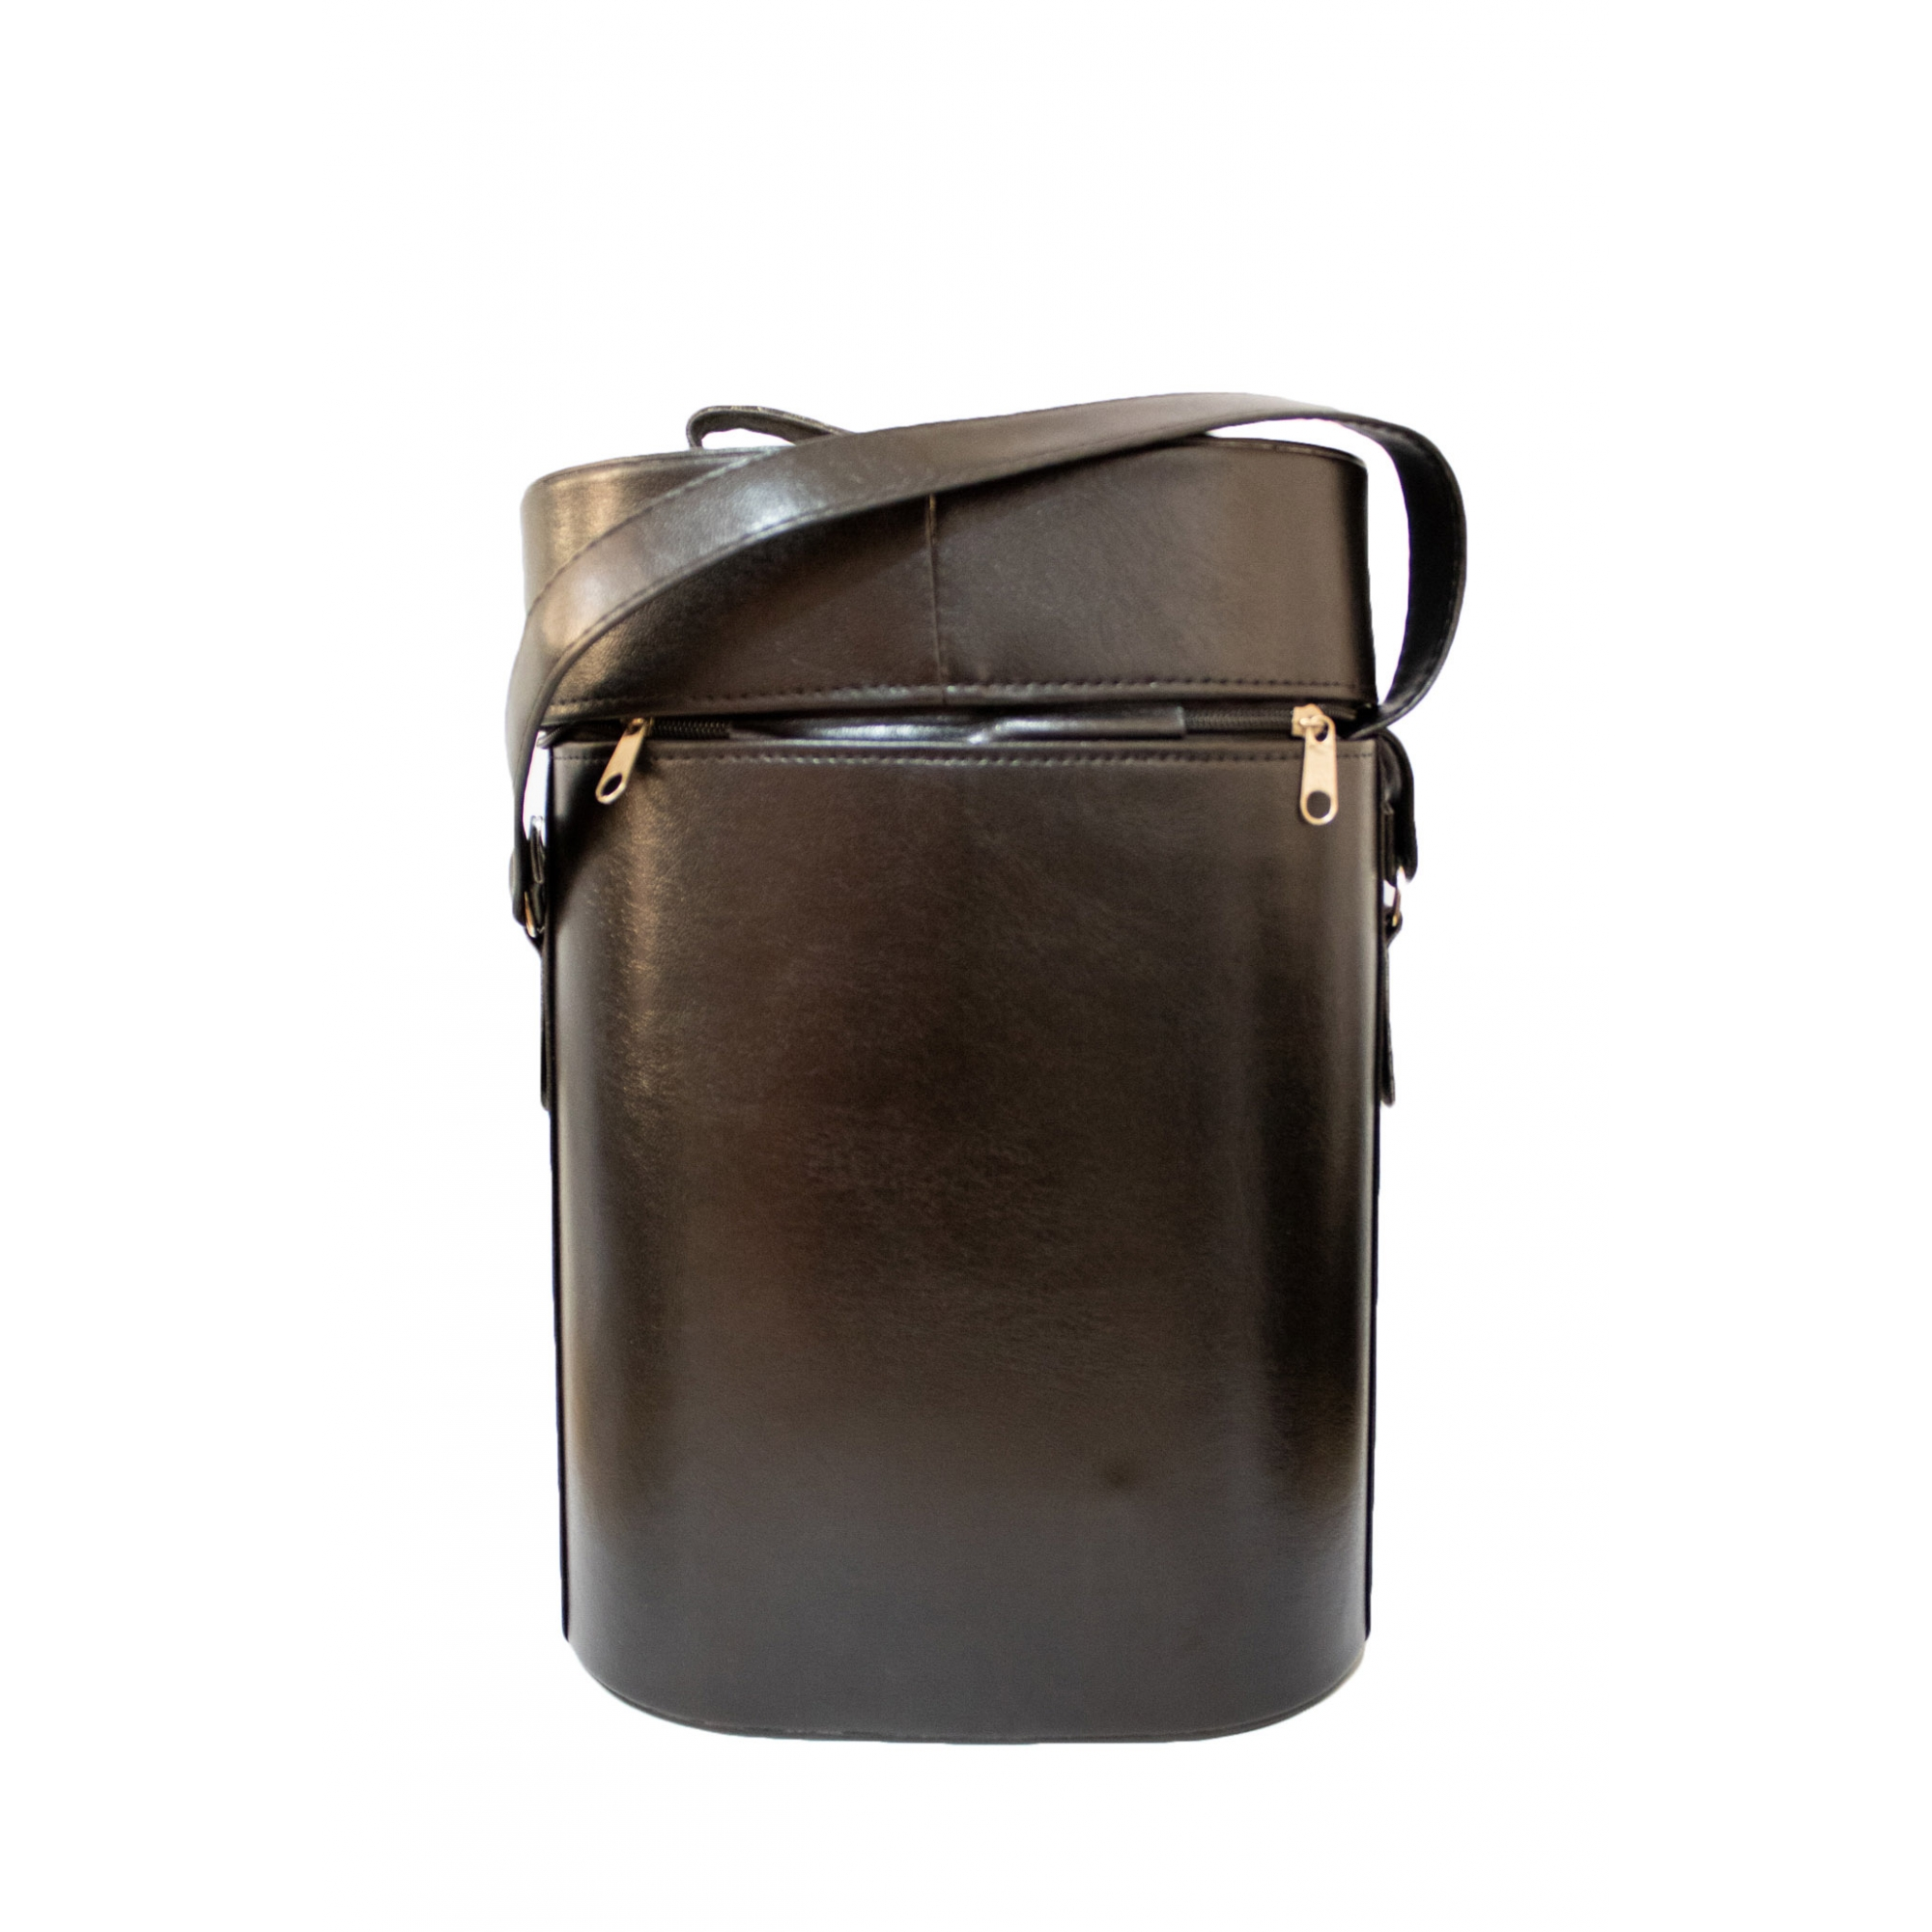 Conjunto chimarrão mateira 1 litro, térmica, cuia cerâmica lisa, bomba inox e porta erva